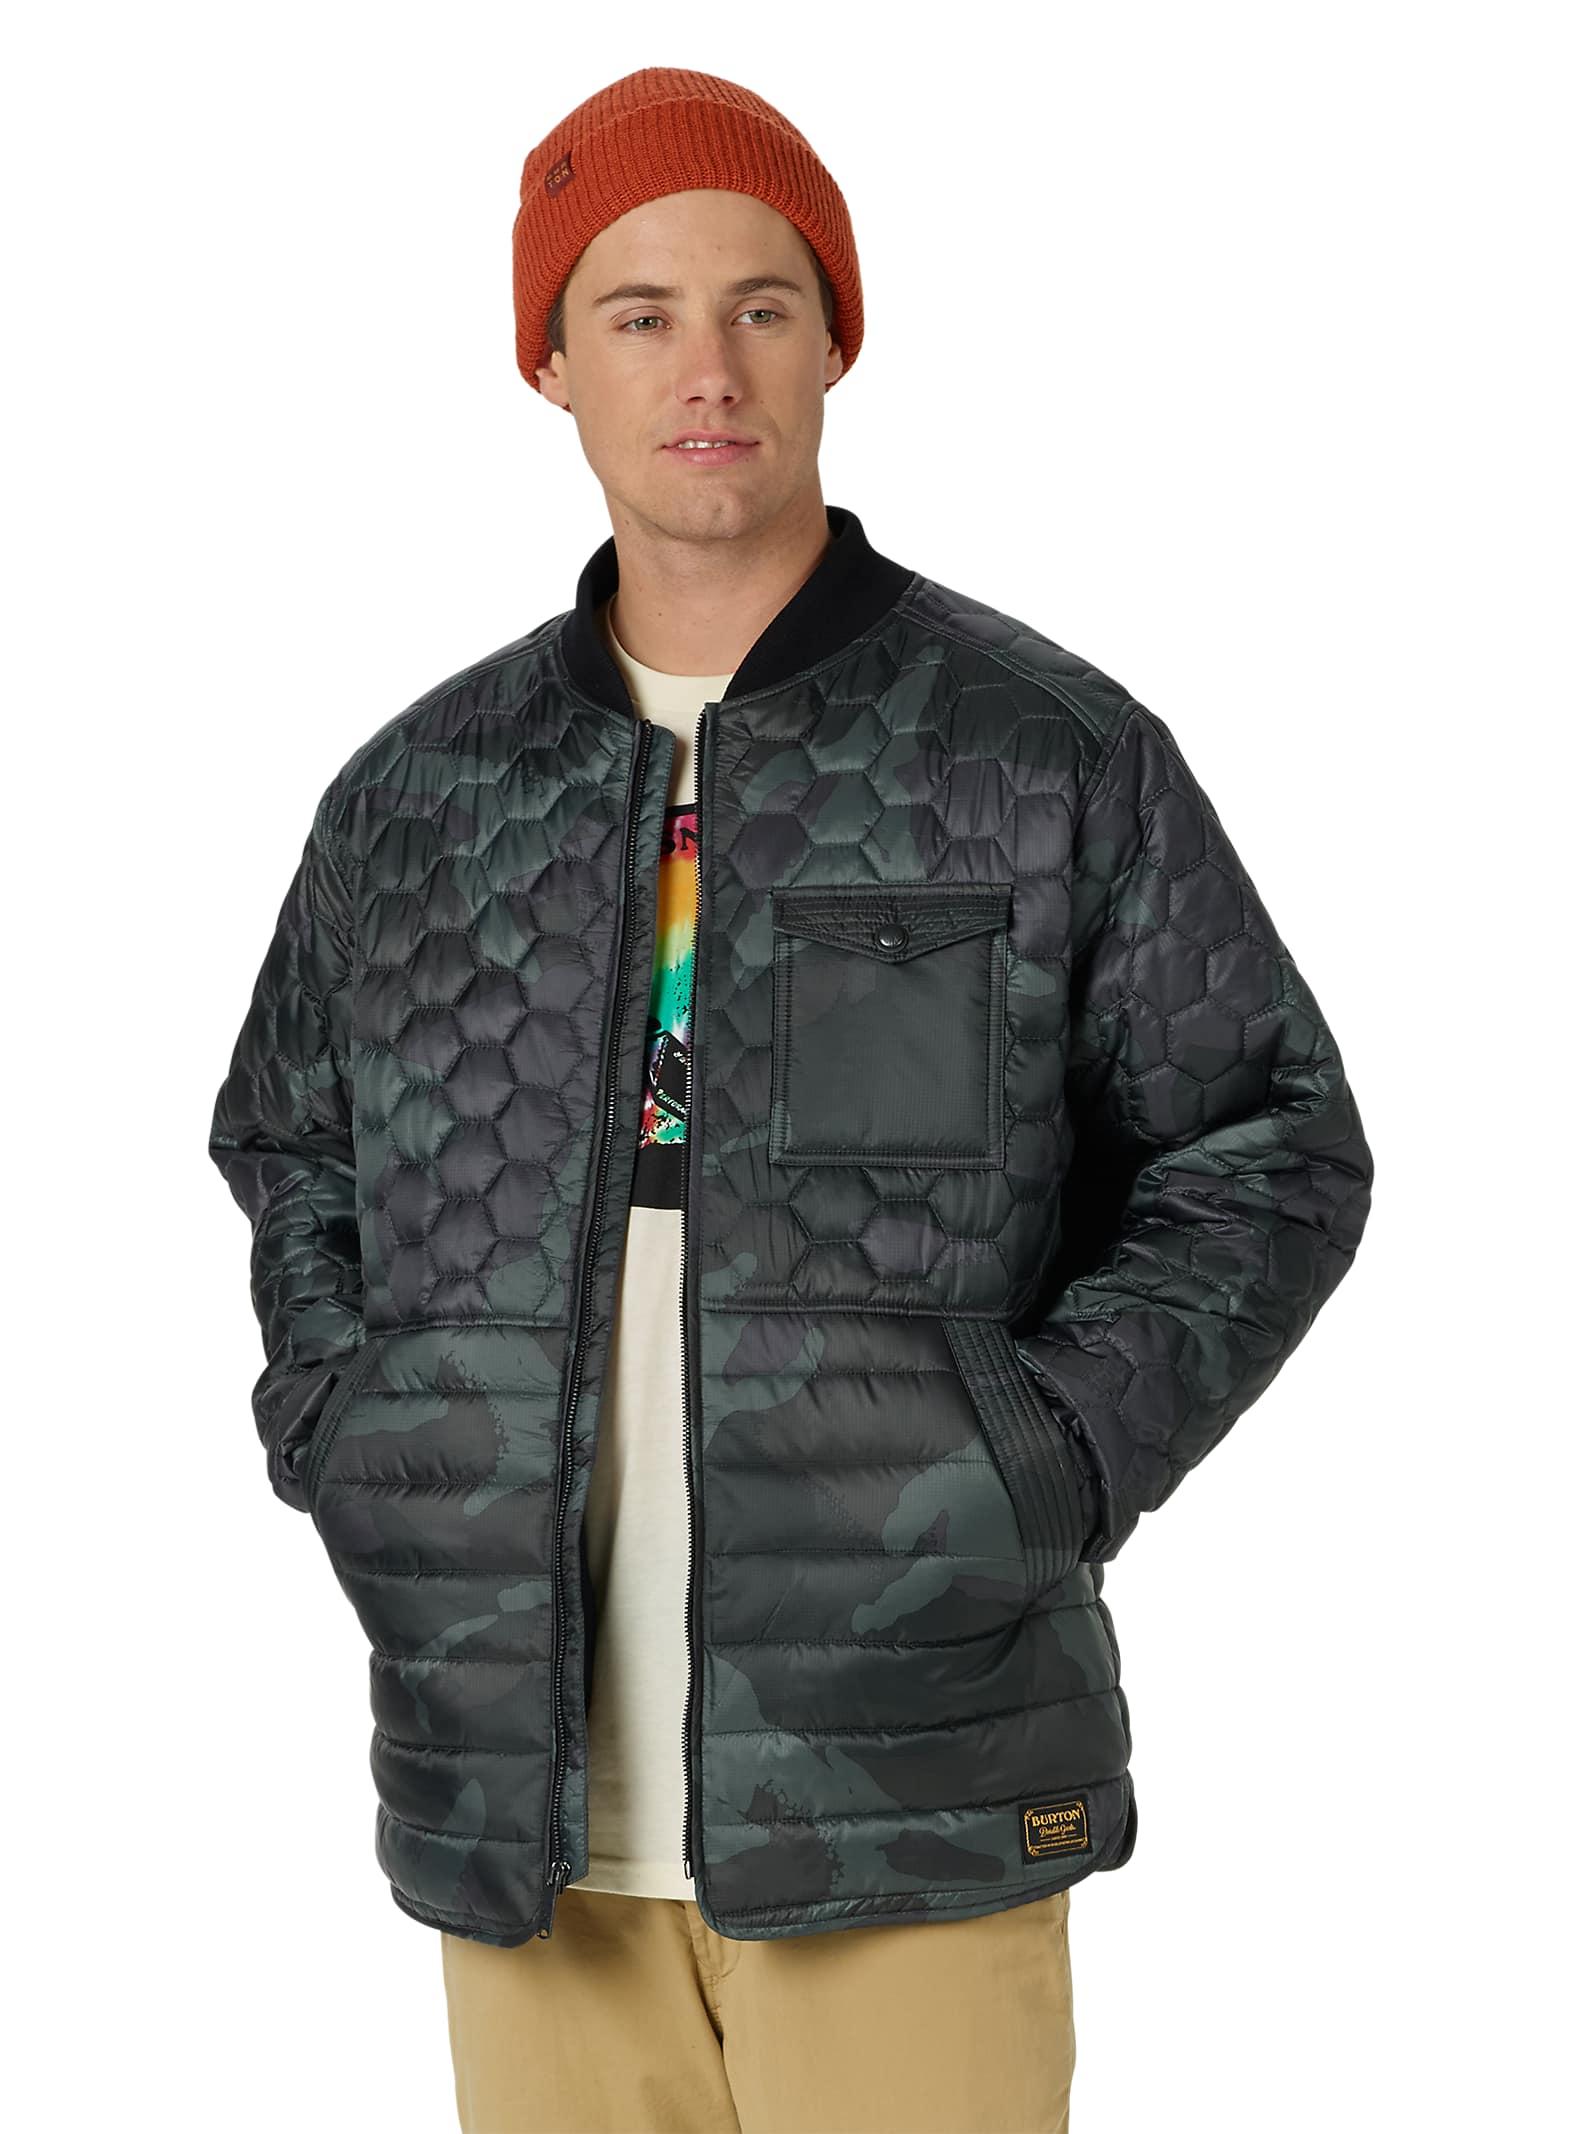 993c09238bb Burton Mallett Bomber Jacket